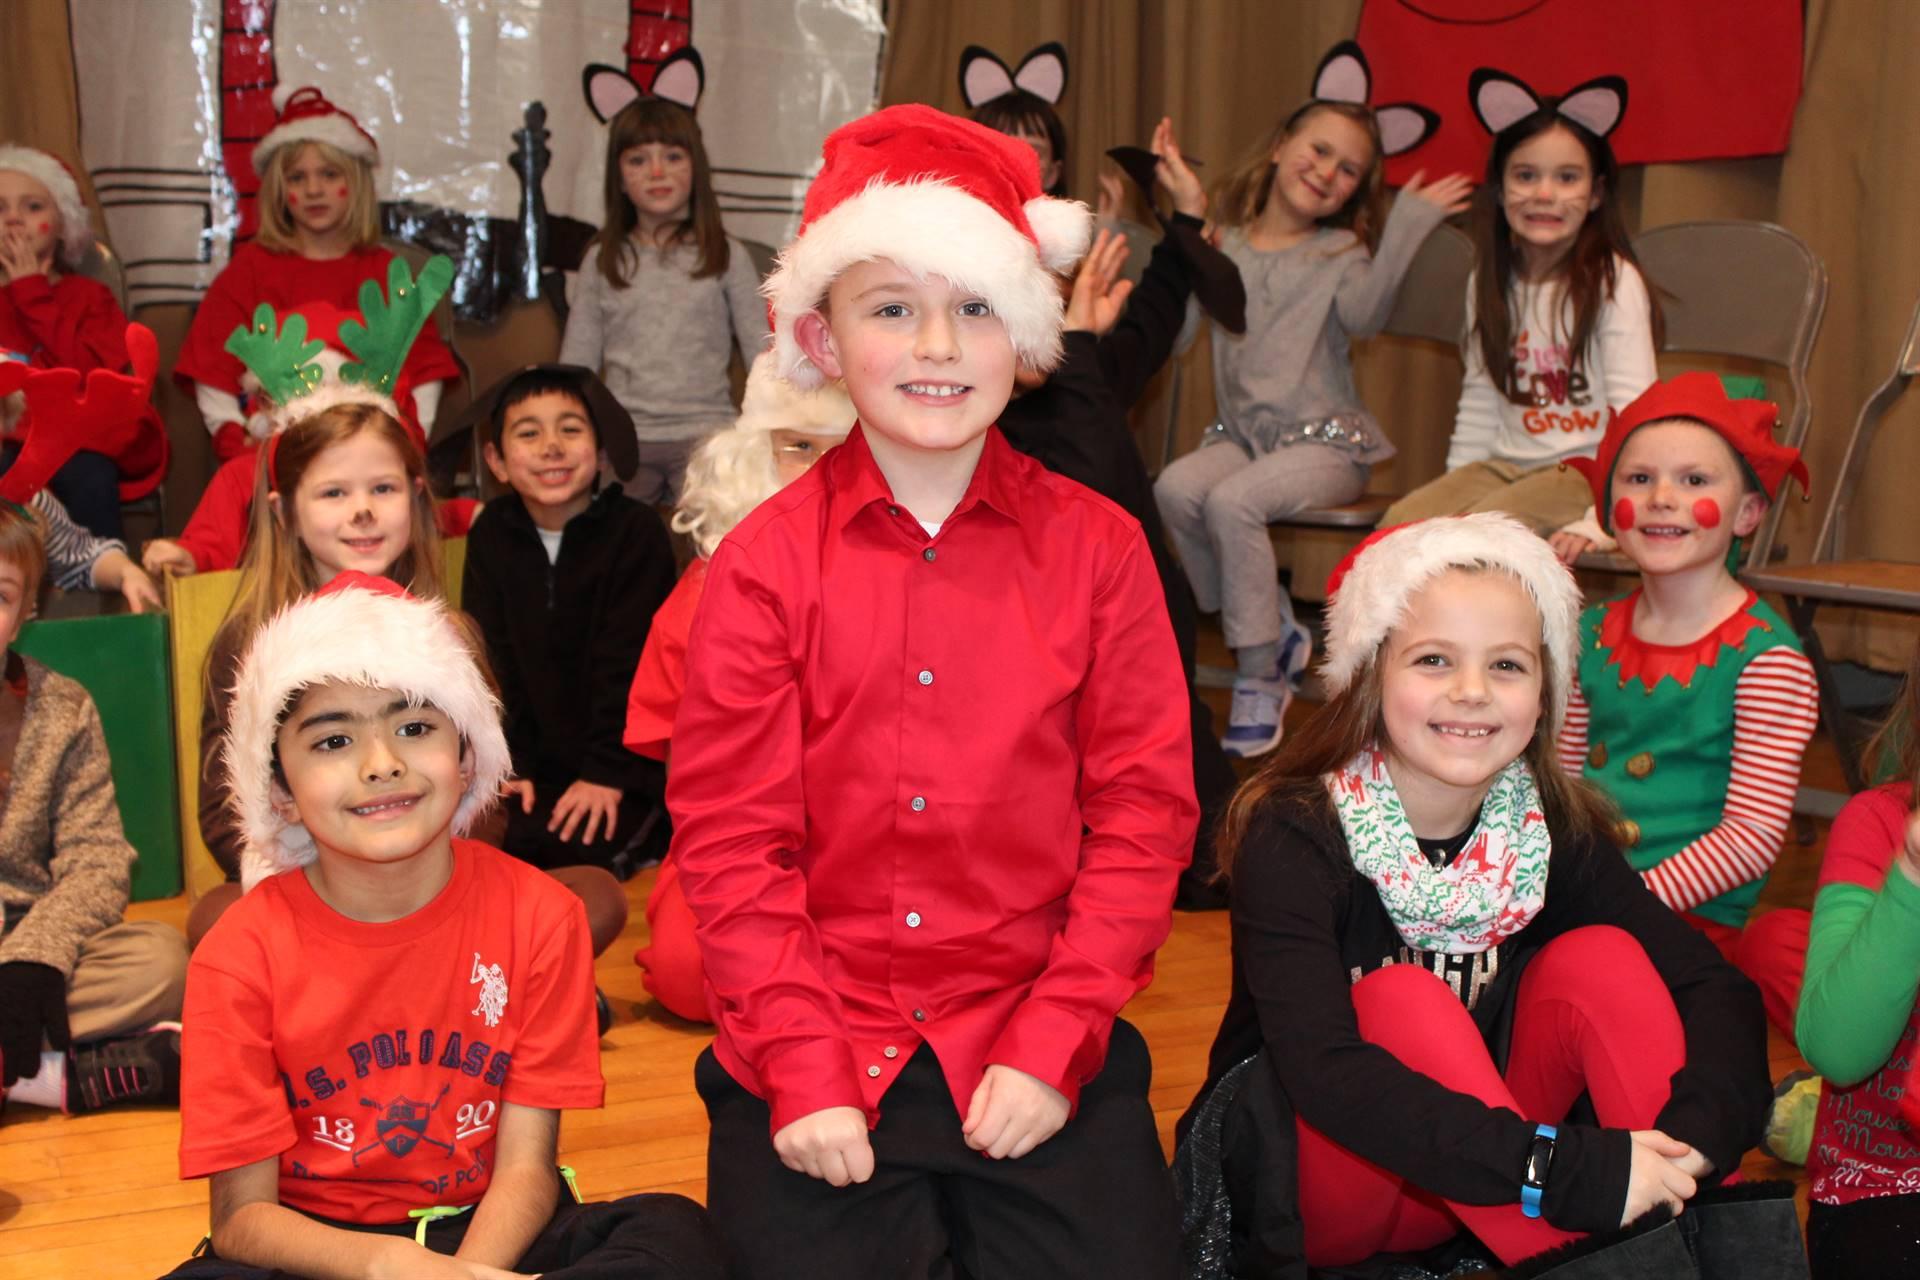 three children wearing Santa hats